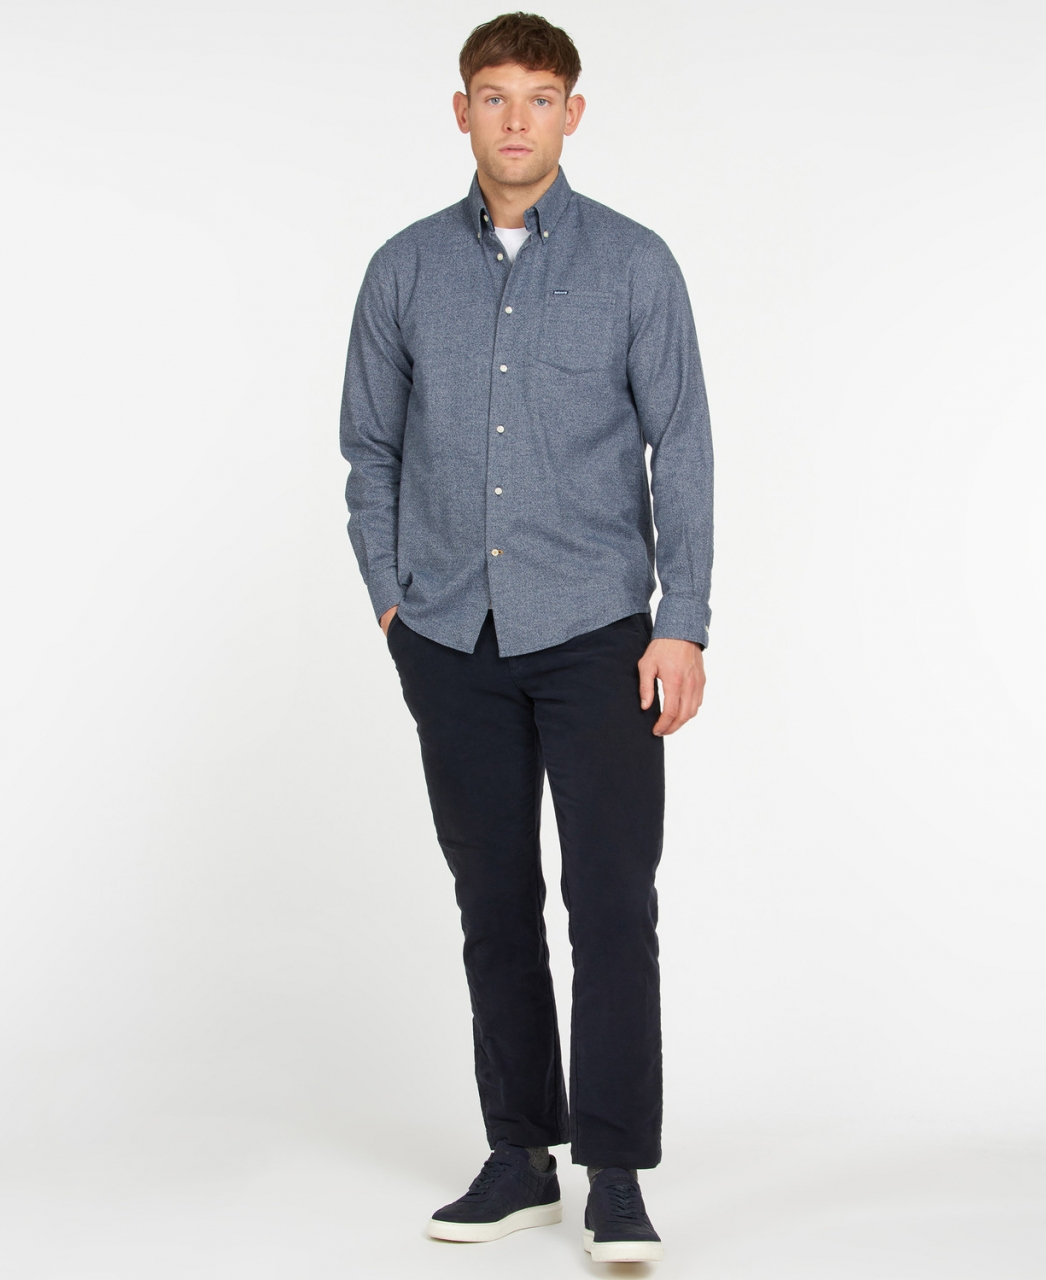 Barbour Priestcliffe Tailored Shirt - navy